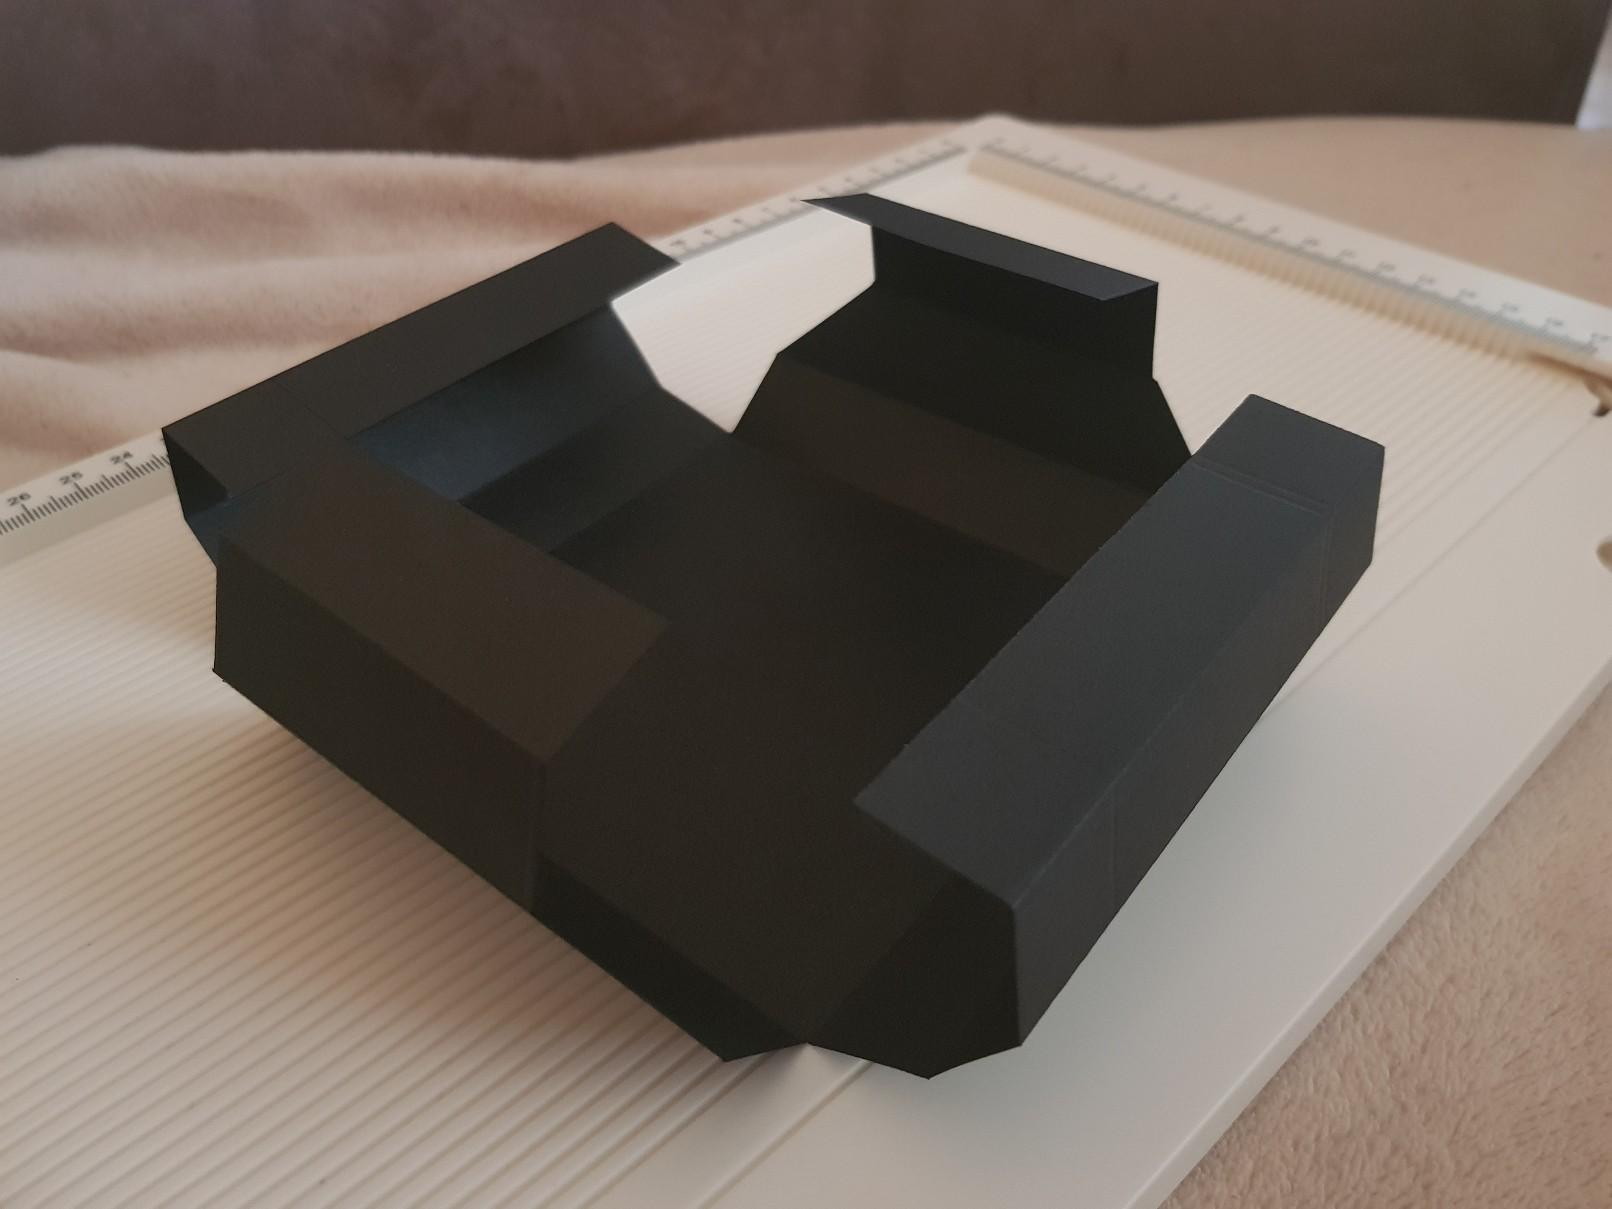 shadow box base scored bend